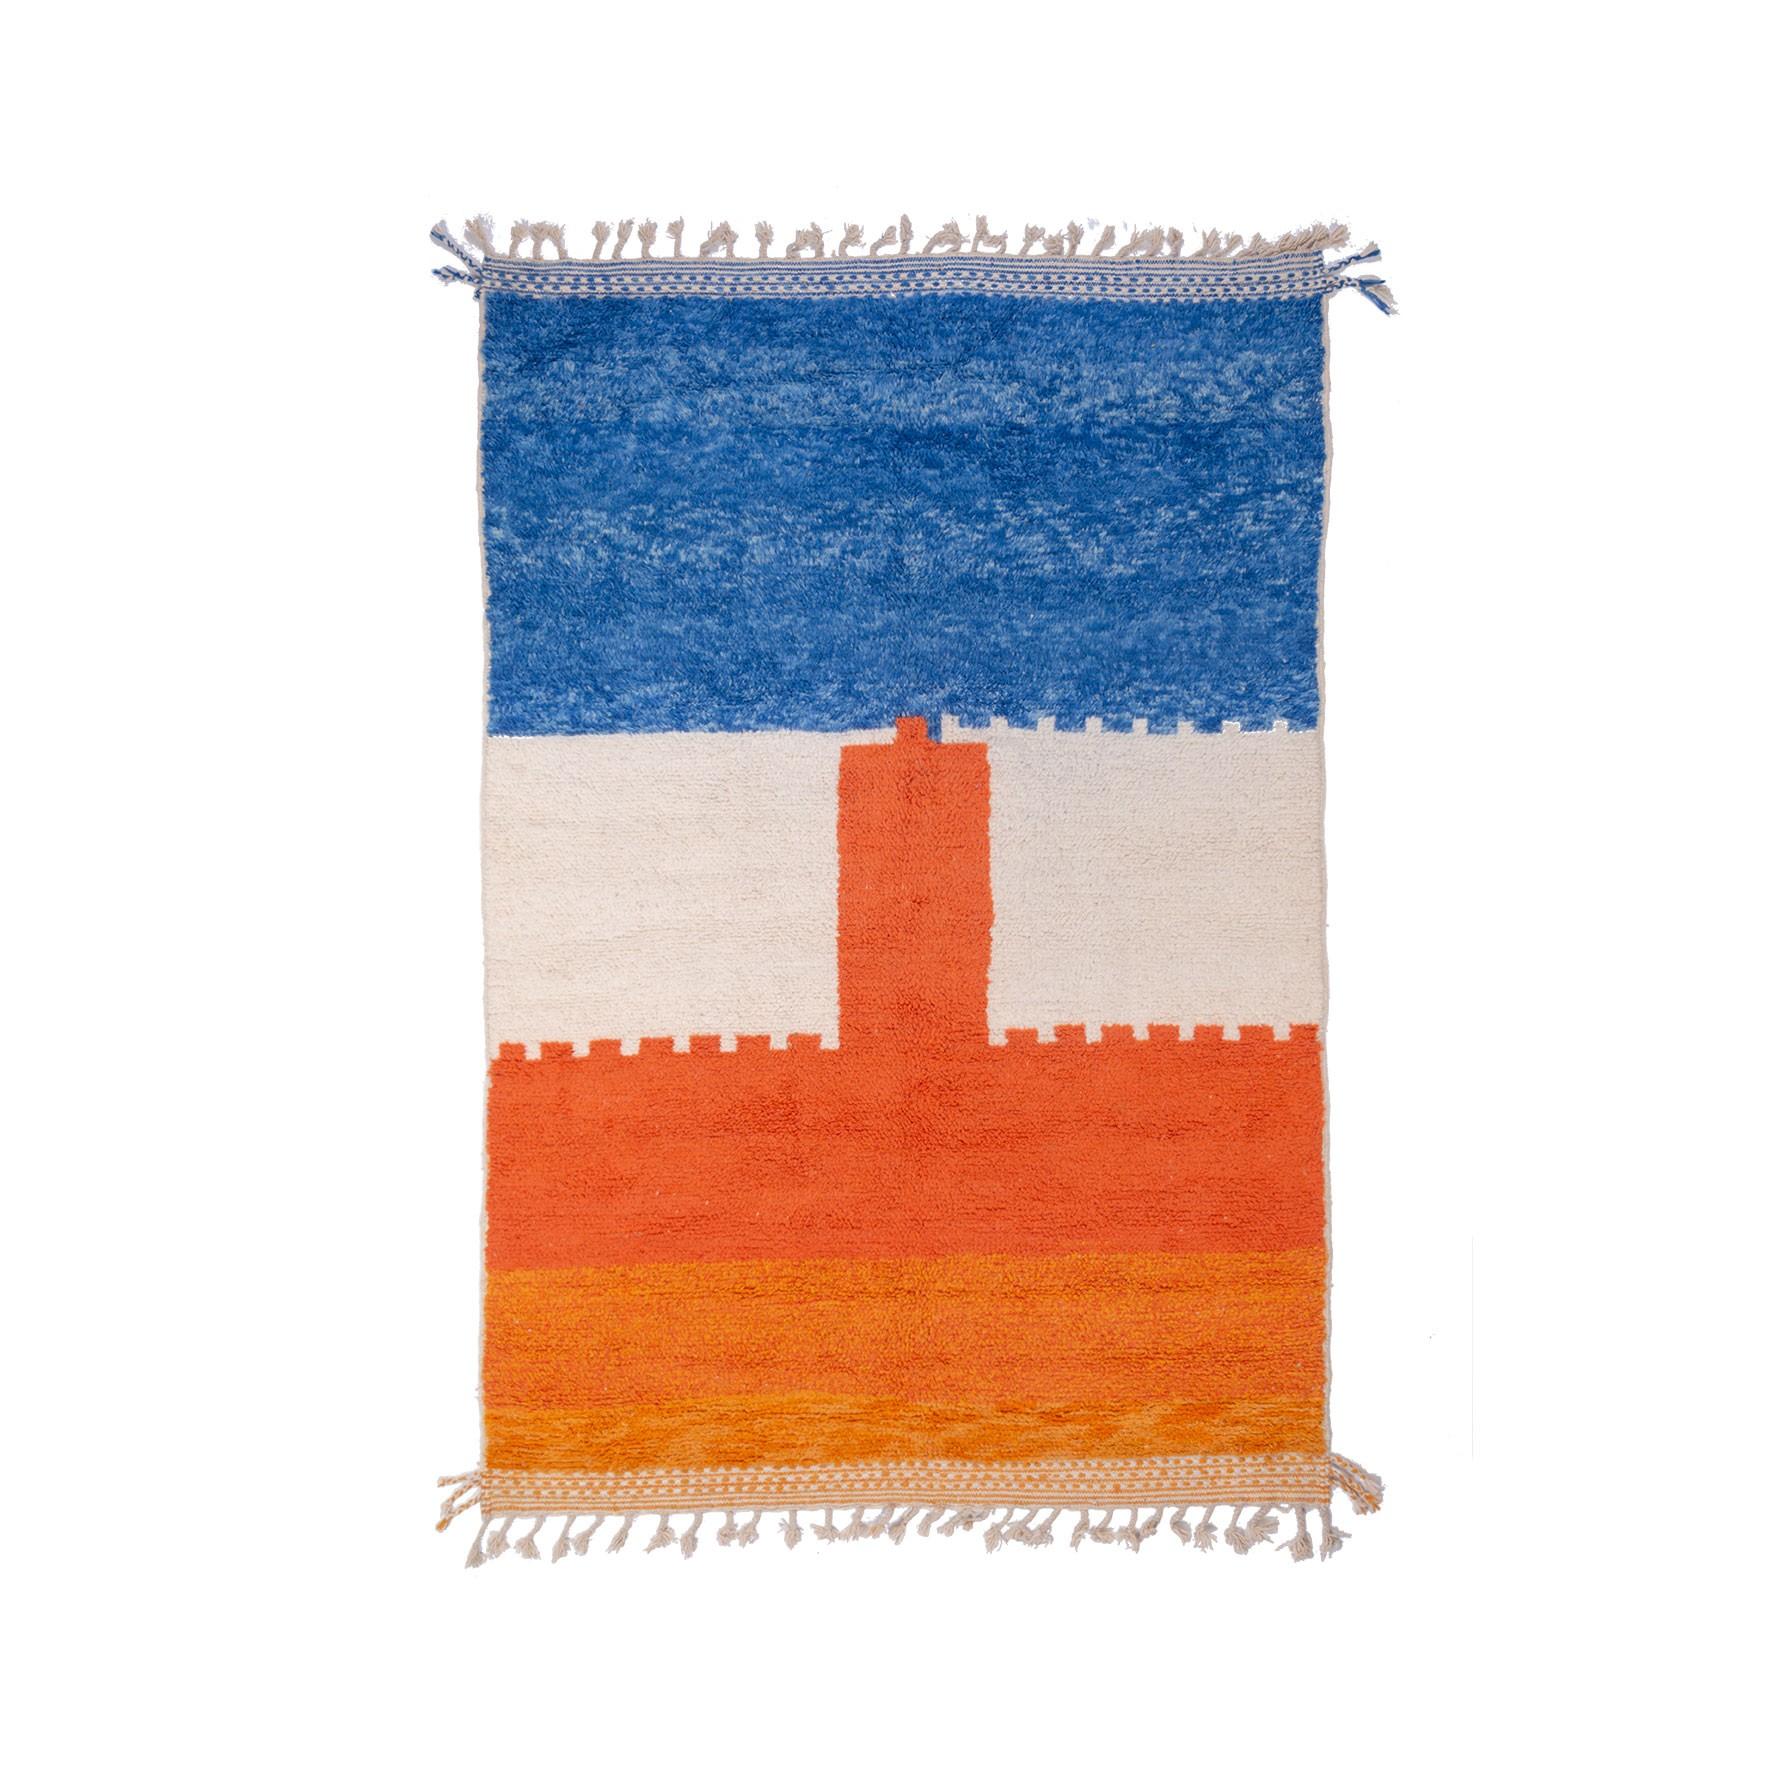 Beni Ouarain carpet 3 tones in shades